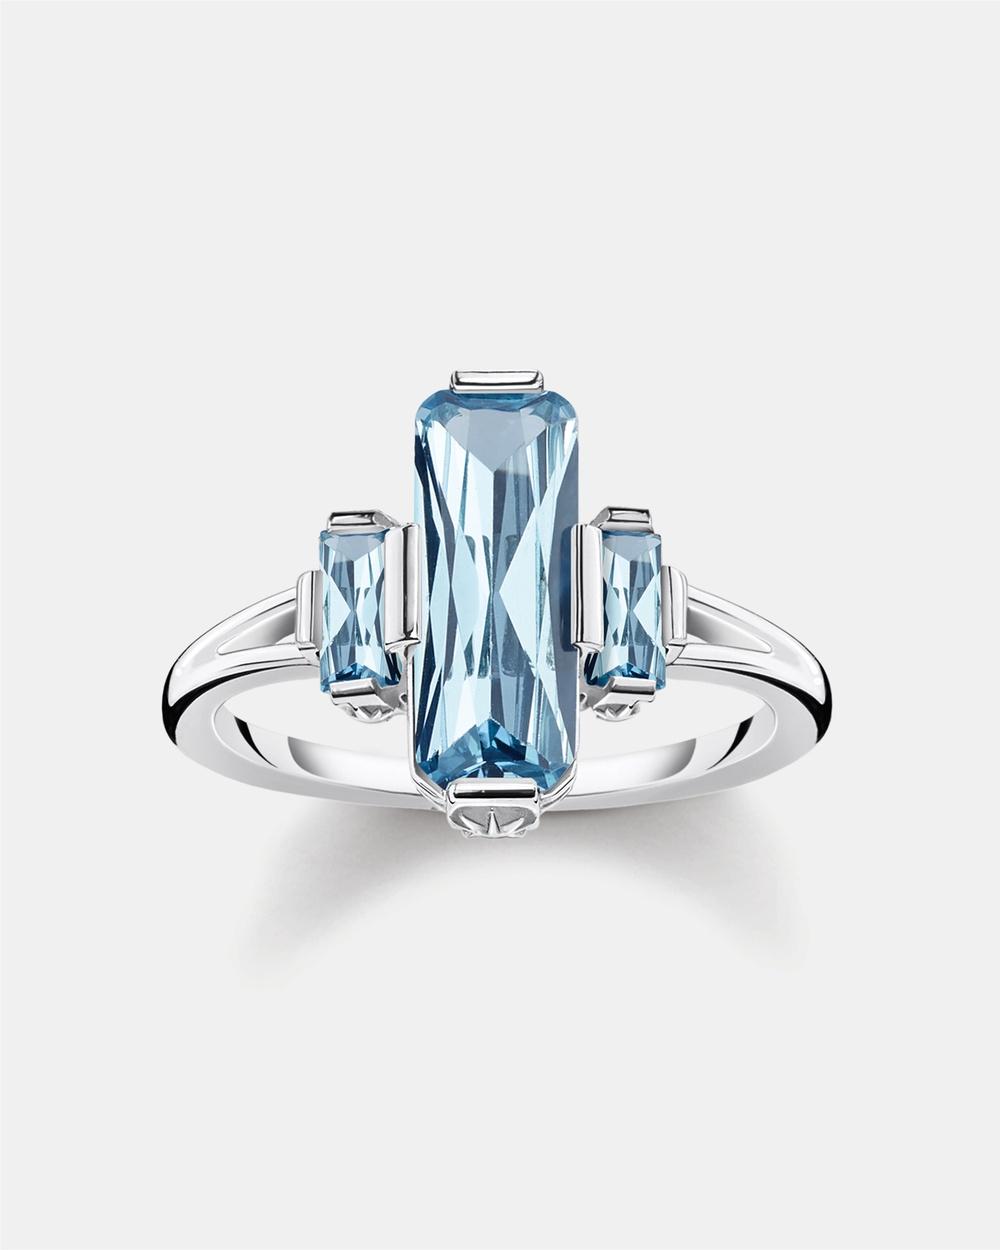 THOMAS SABO Ring Blue Stones Jewellery Blue